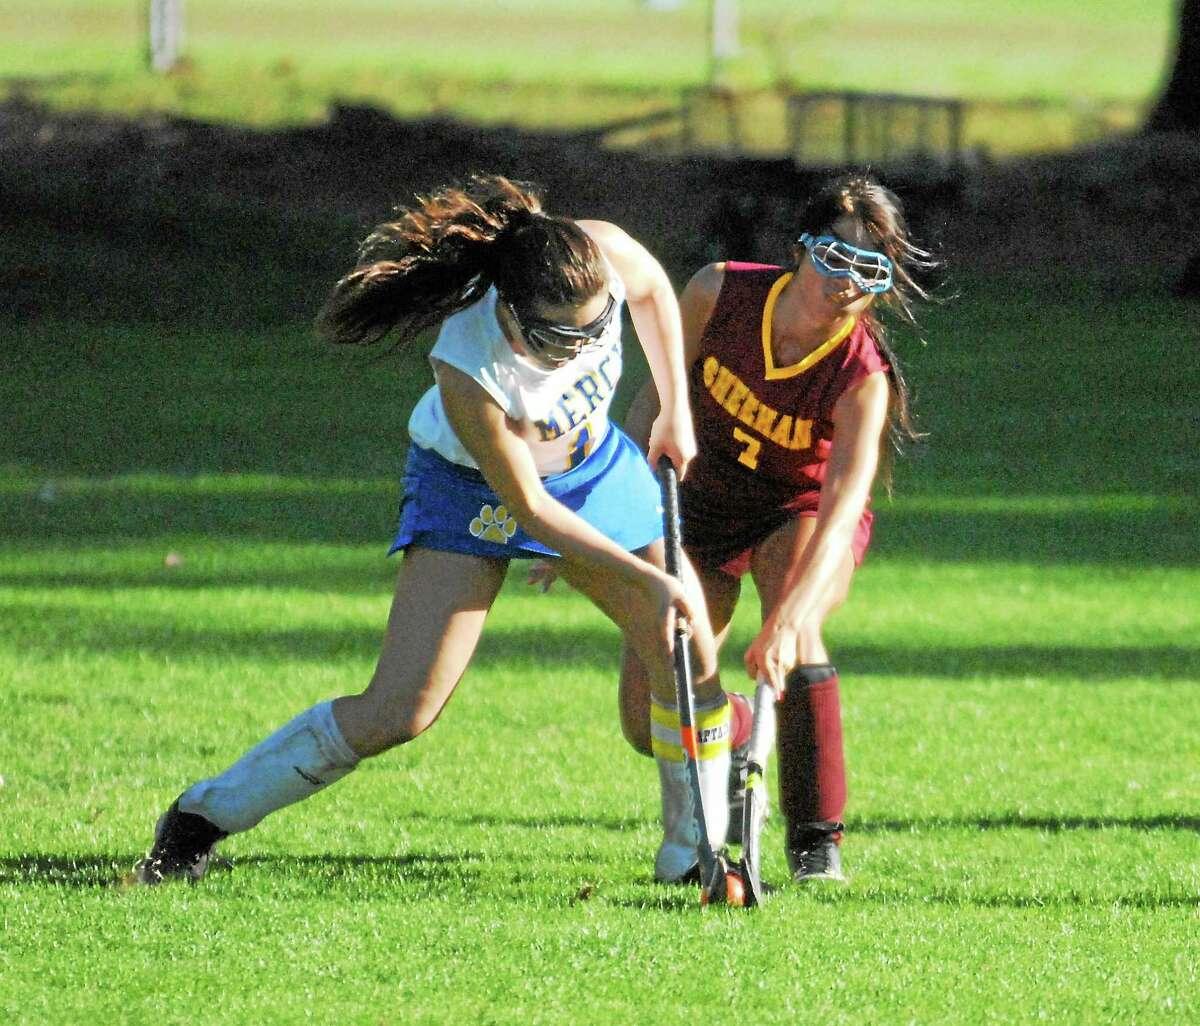 Mercy senior Juliana DellaCamera battles for the ball against Sheehan senior Jessica Berger on Friday.